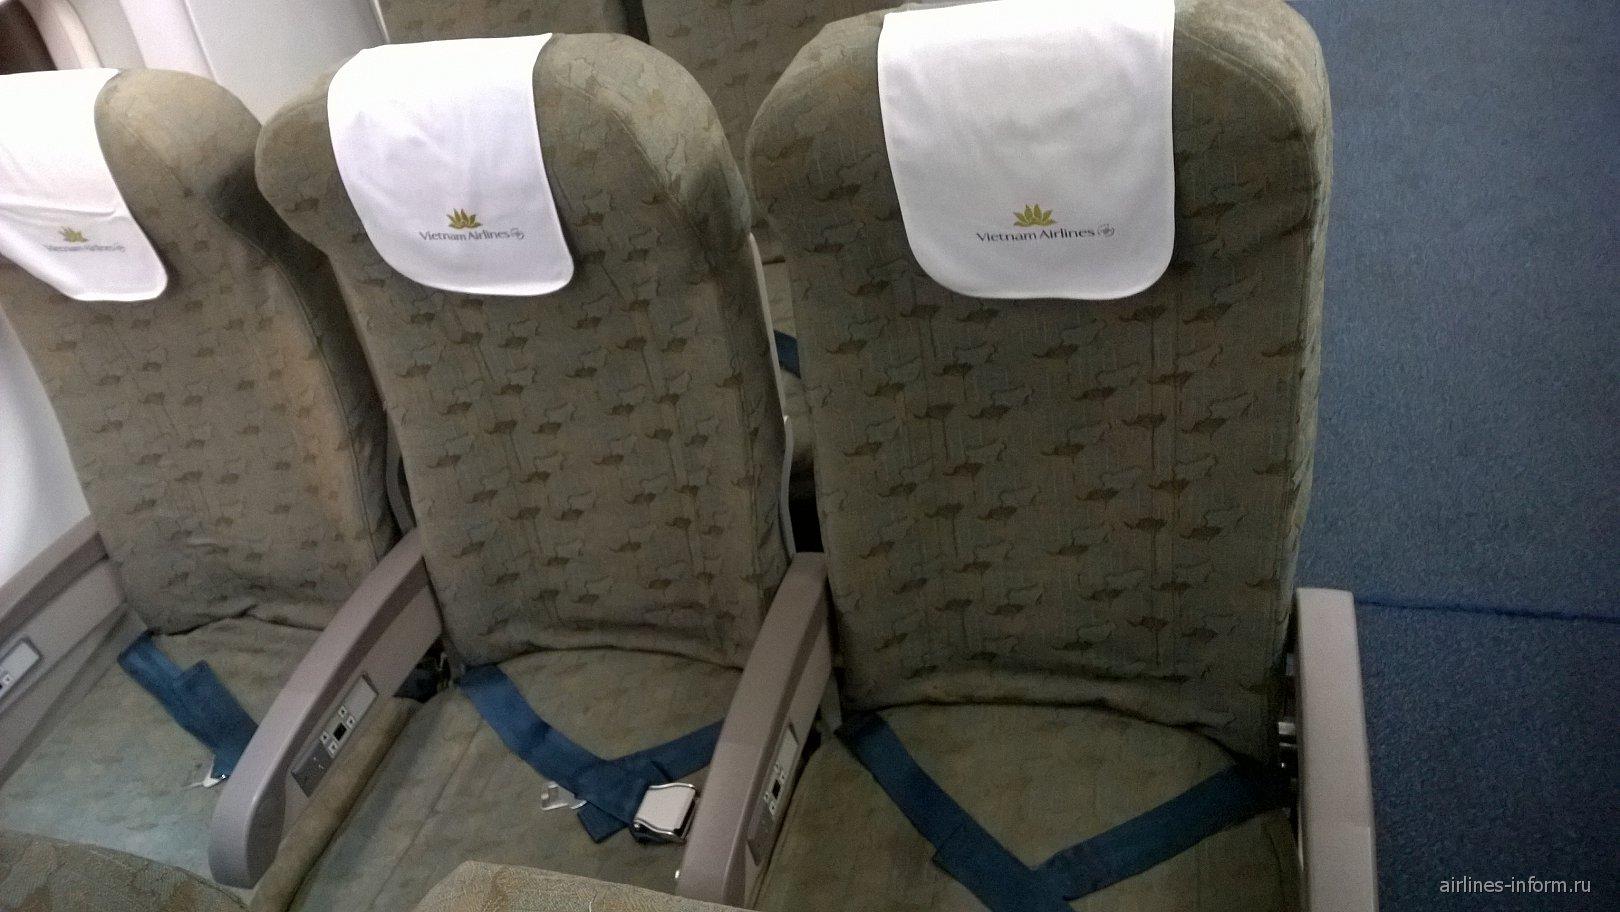 Пассажирские кресла в самолете Airbus A321 Вьетнамских авиалиний